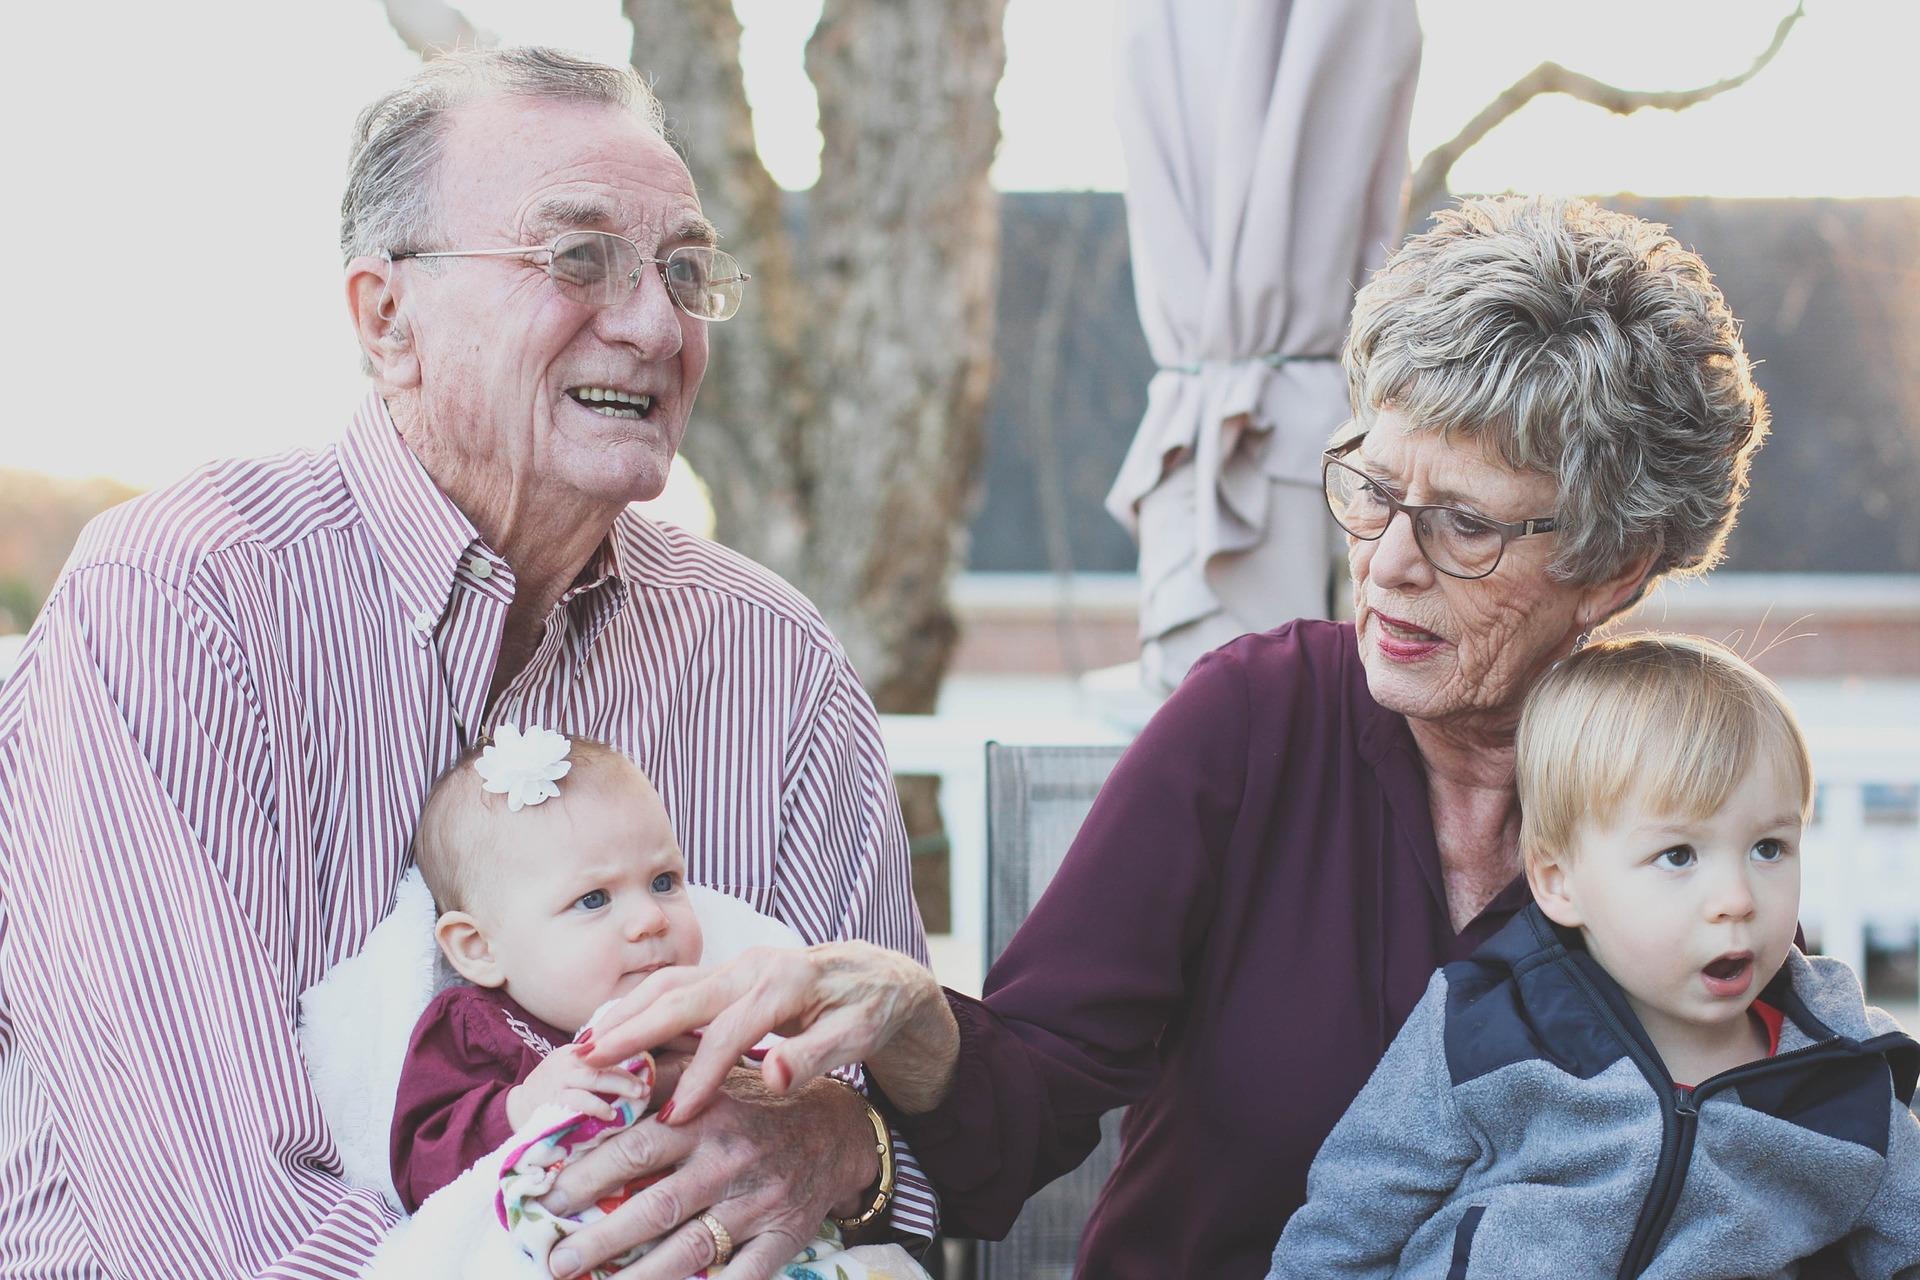 grandparents-1969824_1920_sylviebliss